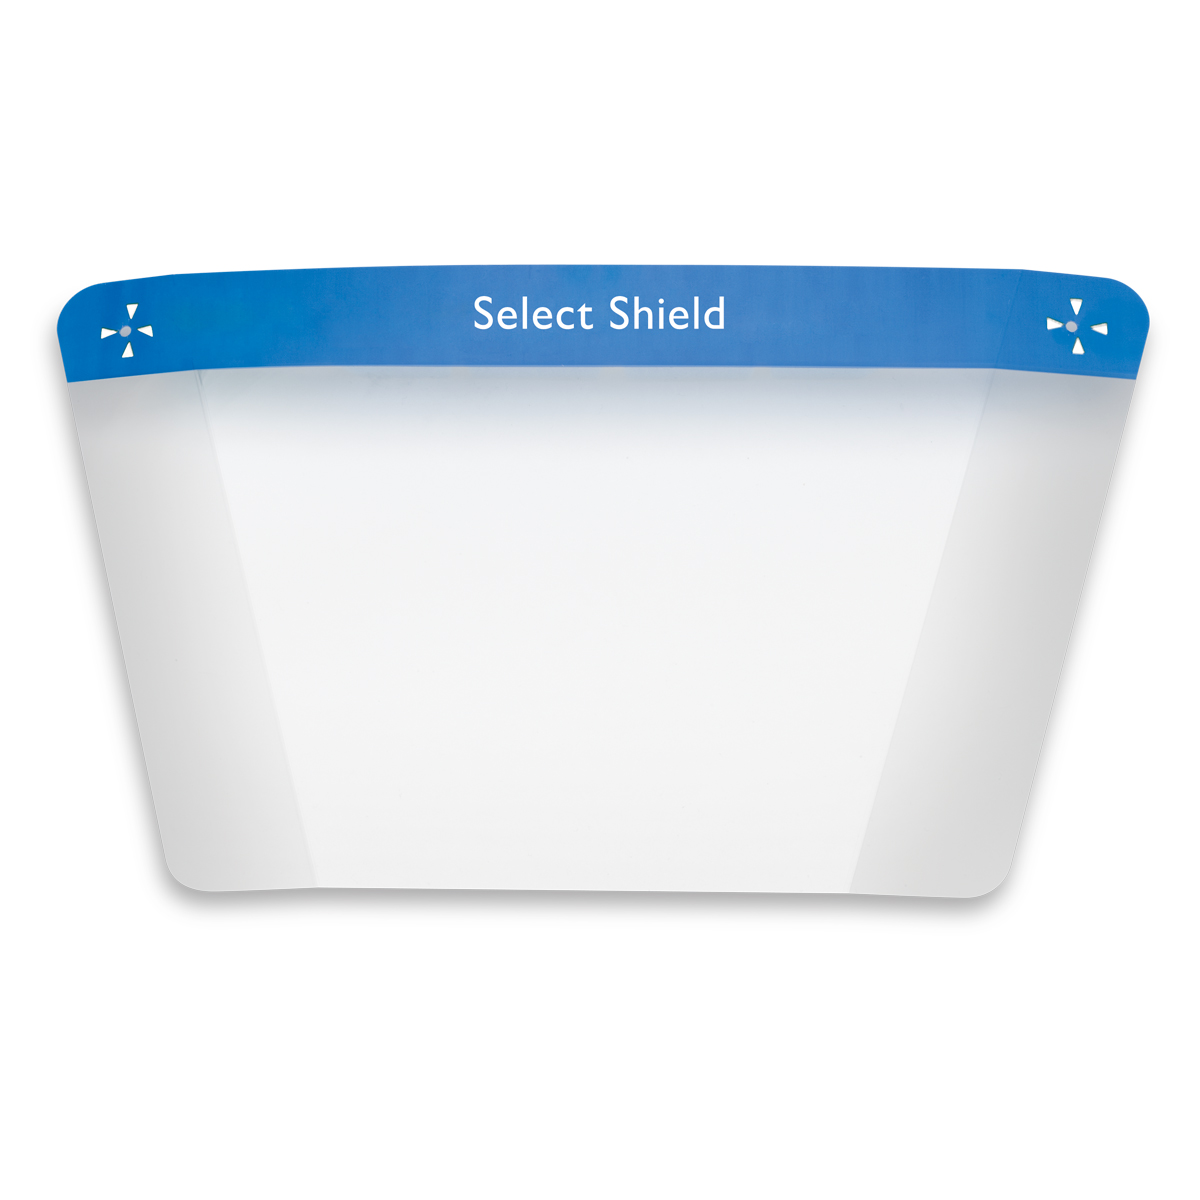 Select Shield - Shields Image